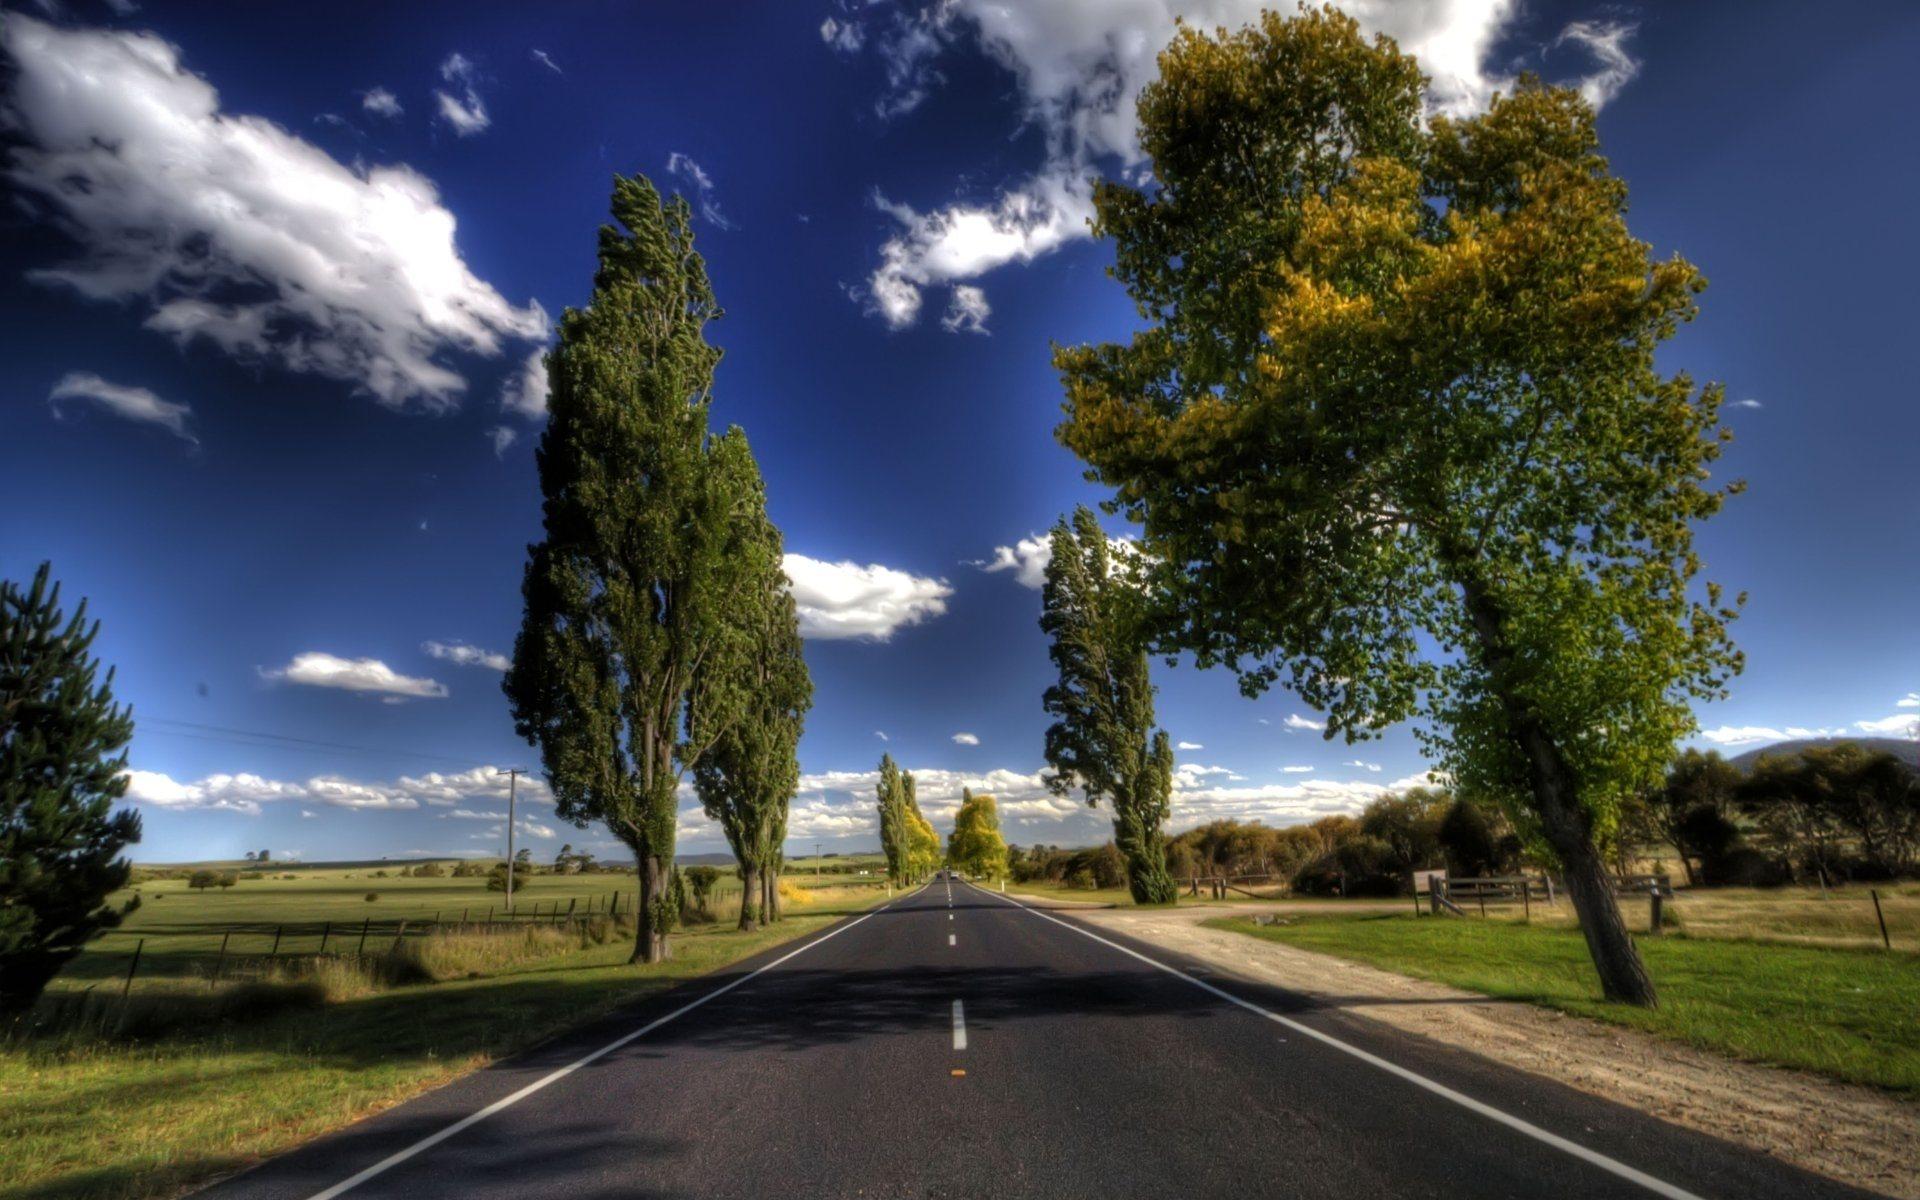 HD Road Wallpapers